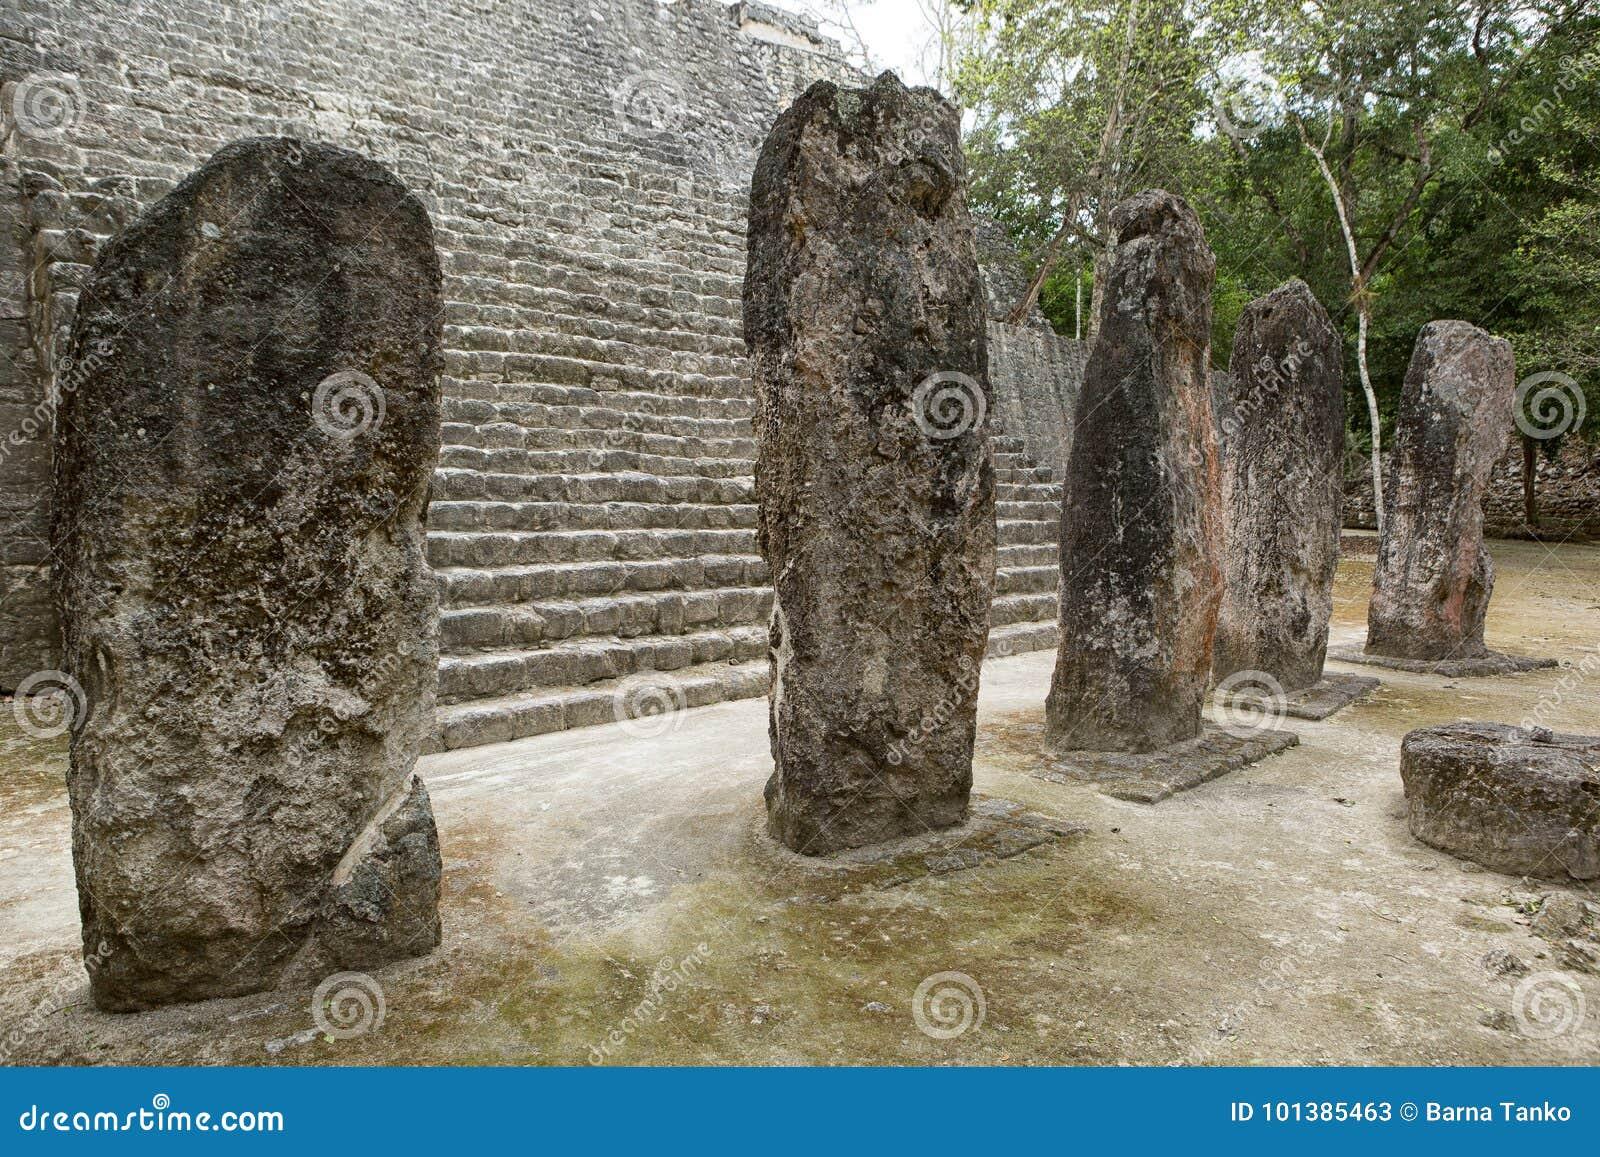 Maya stelae at the Calakmul in Mexico